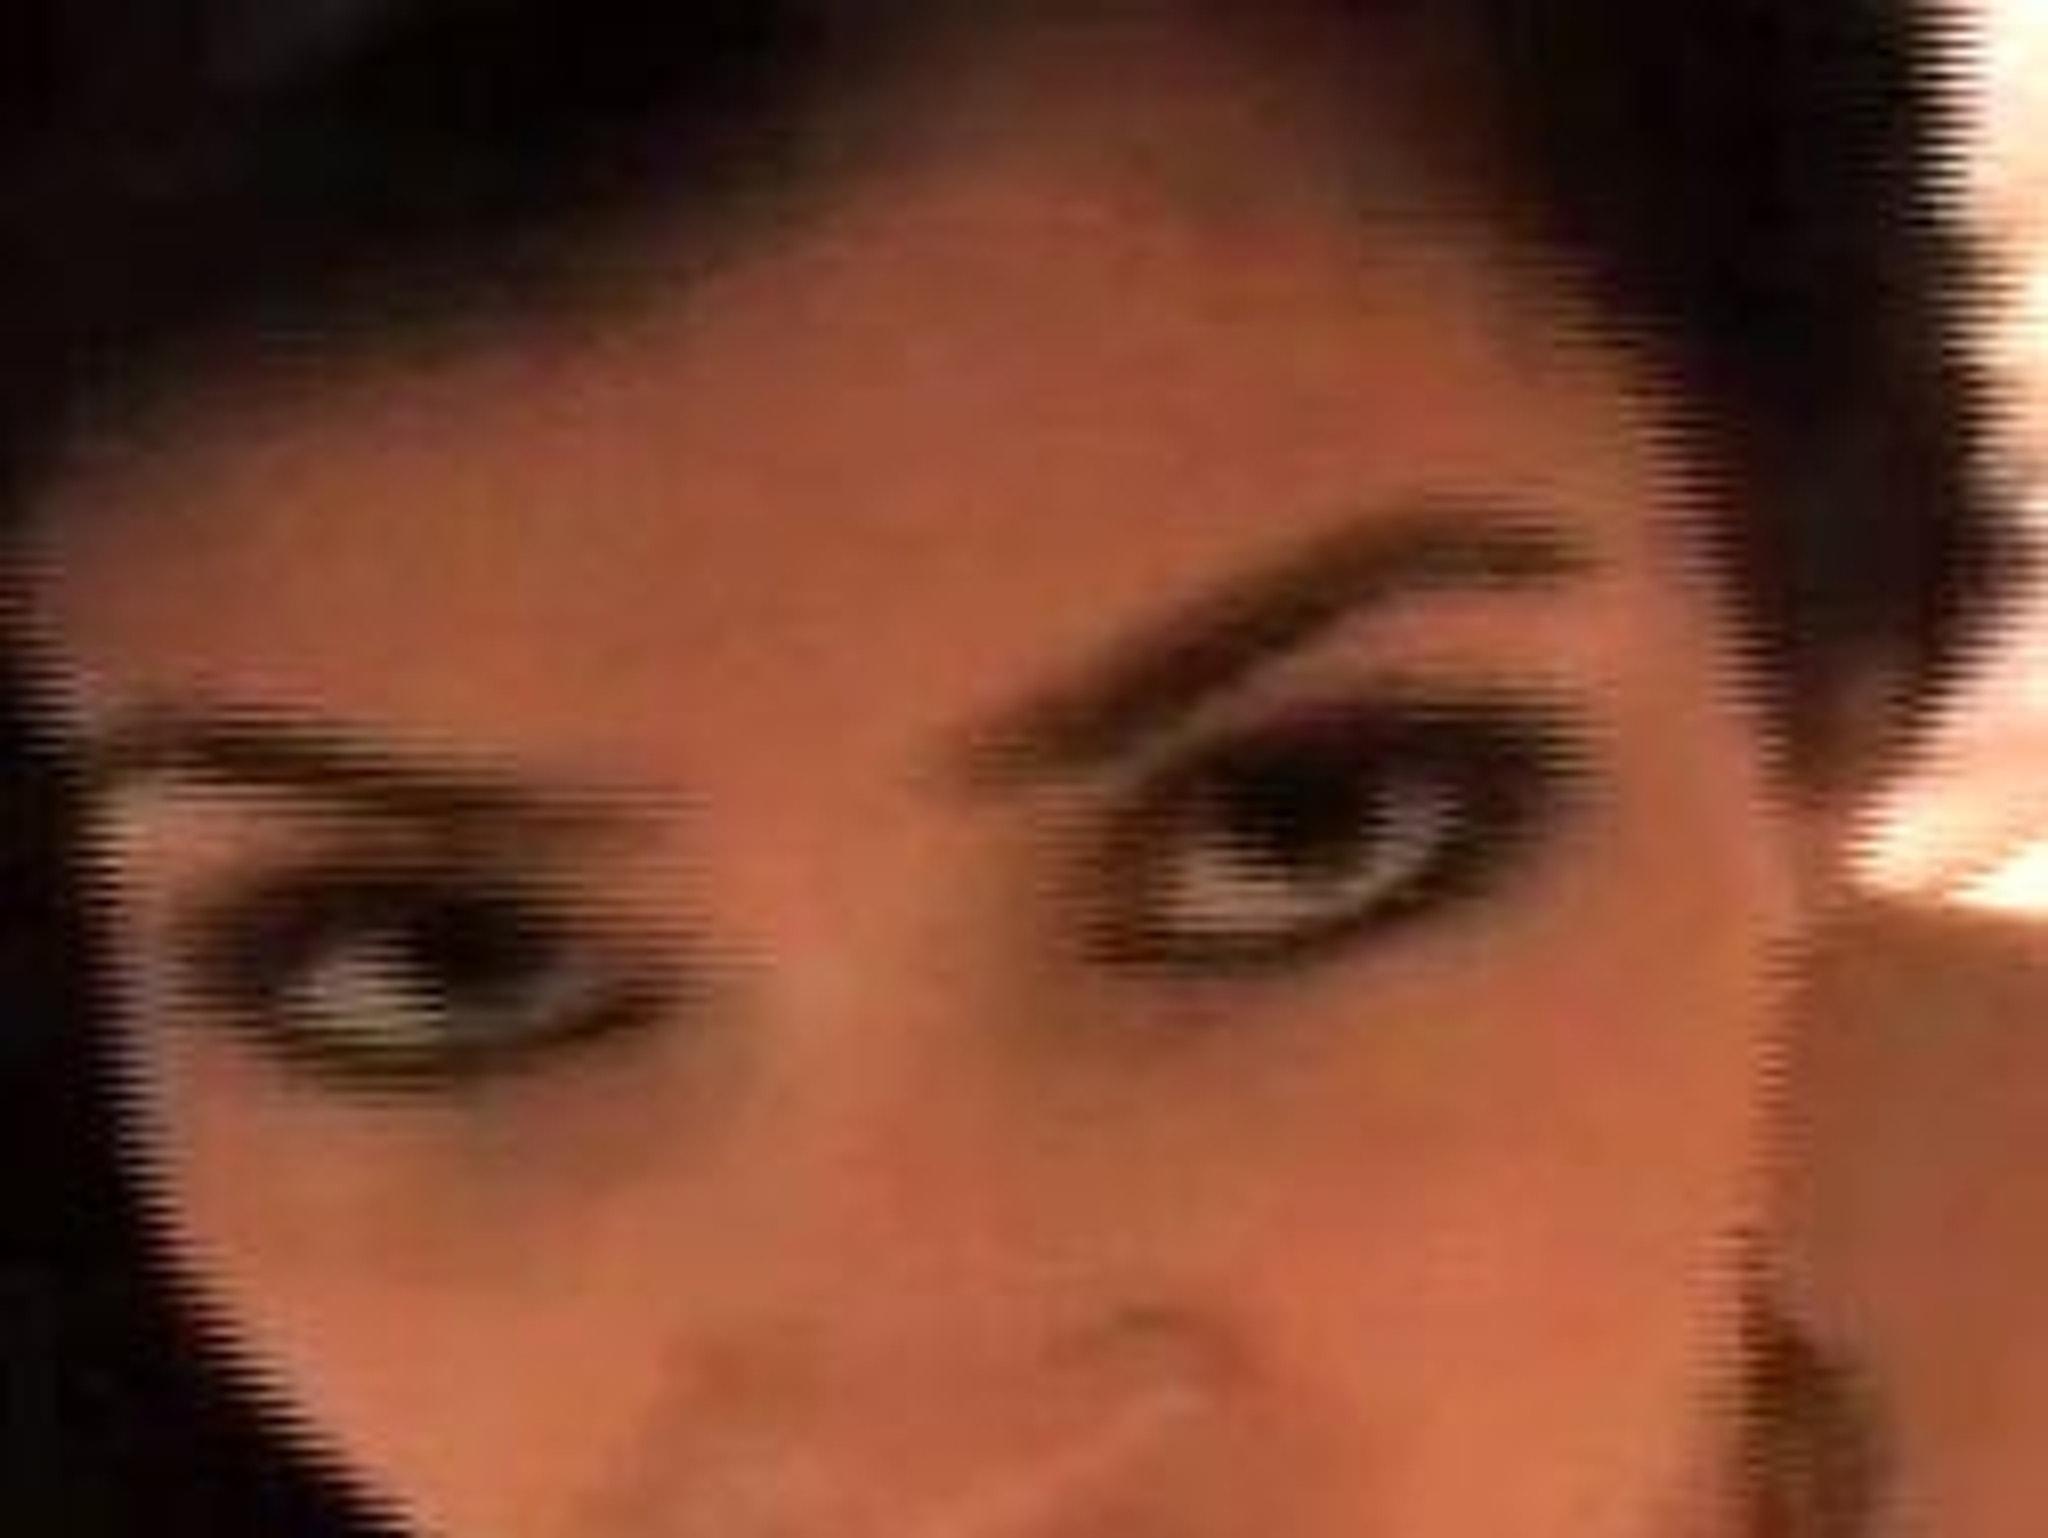 J sex kardashian ray tape kim (18+!) Kim